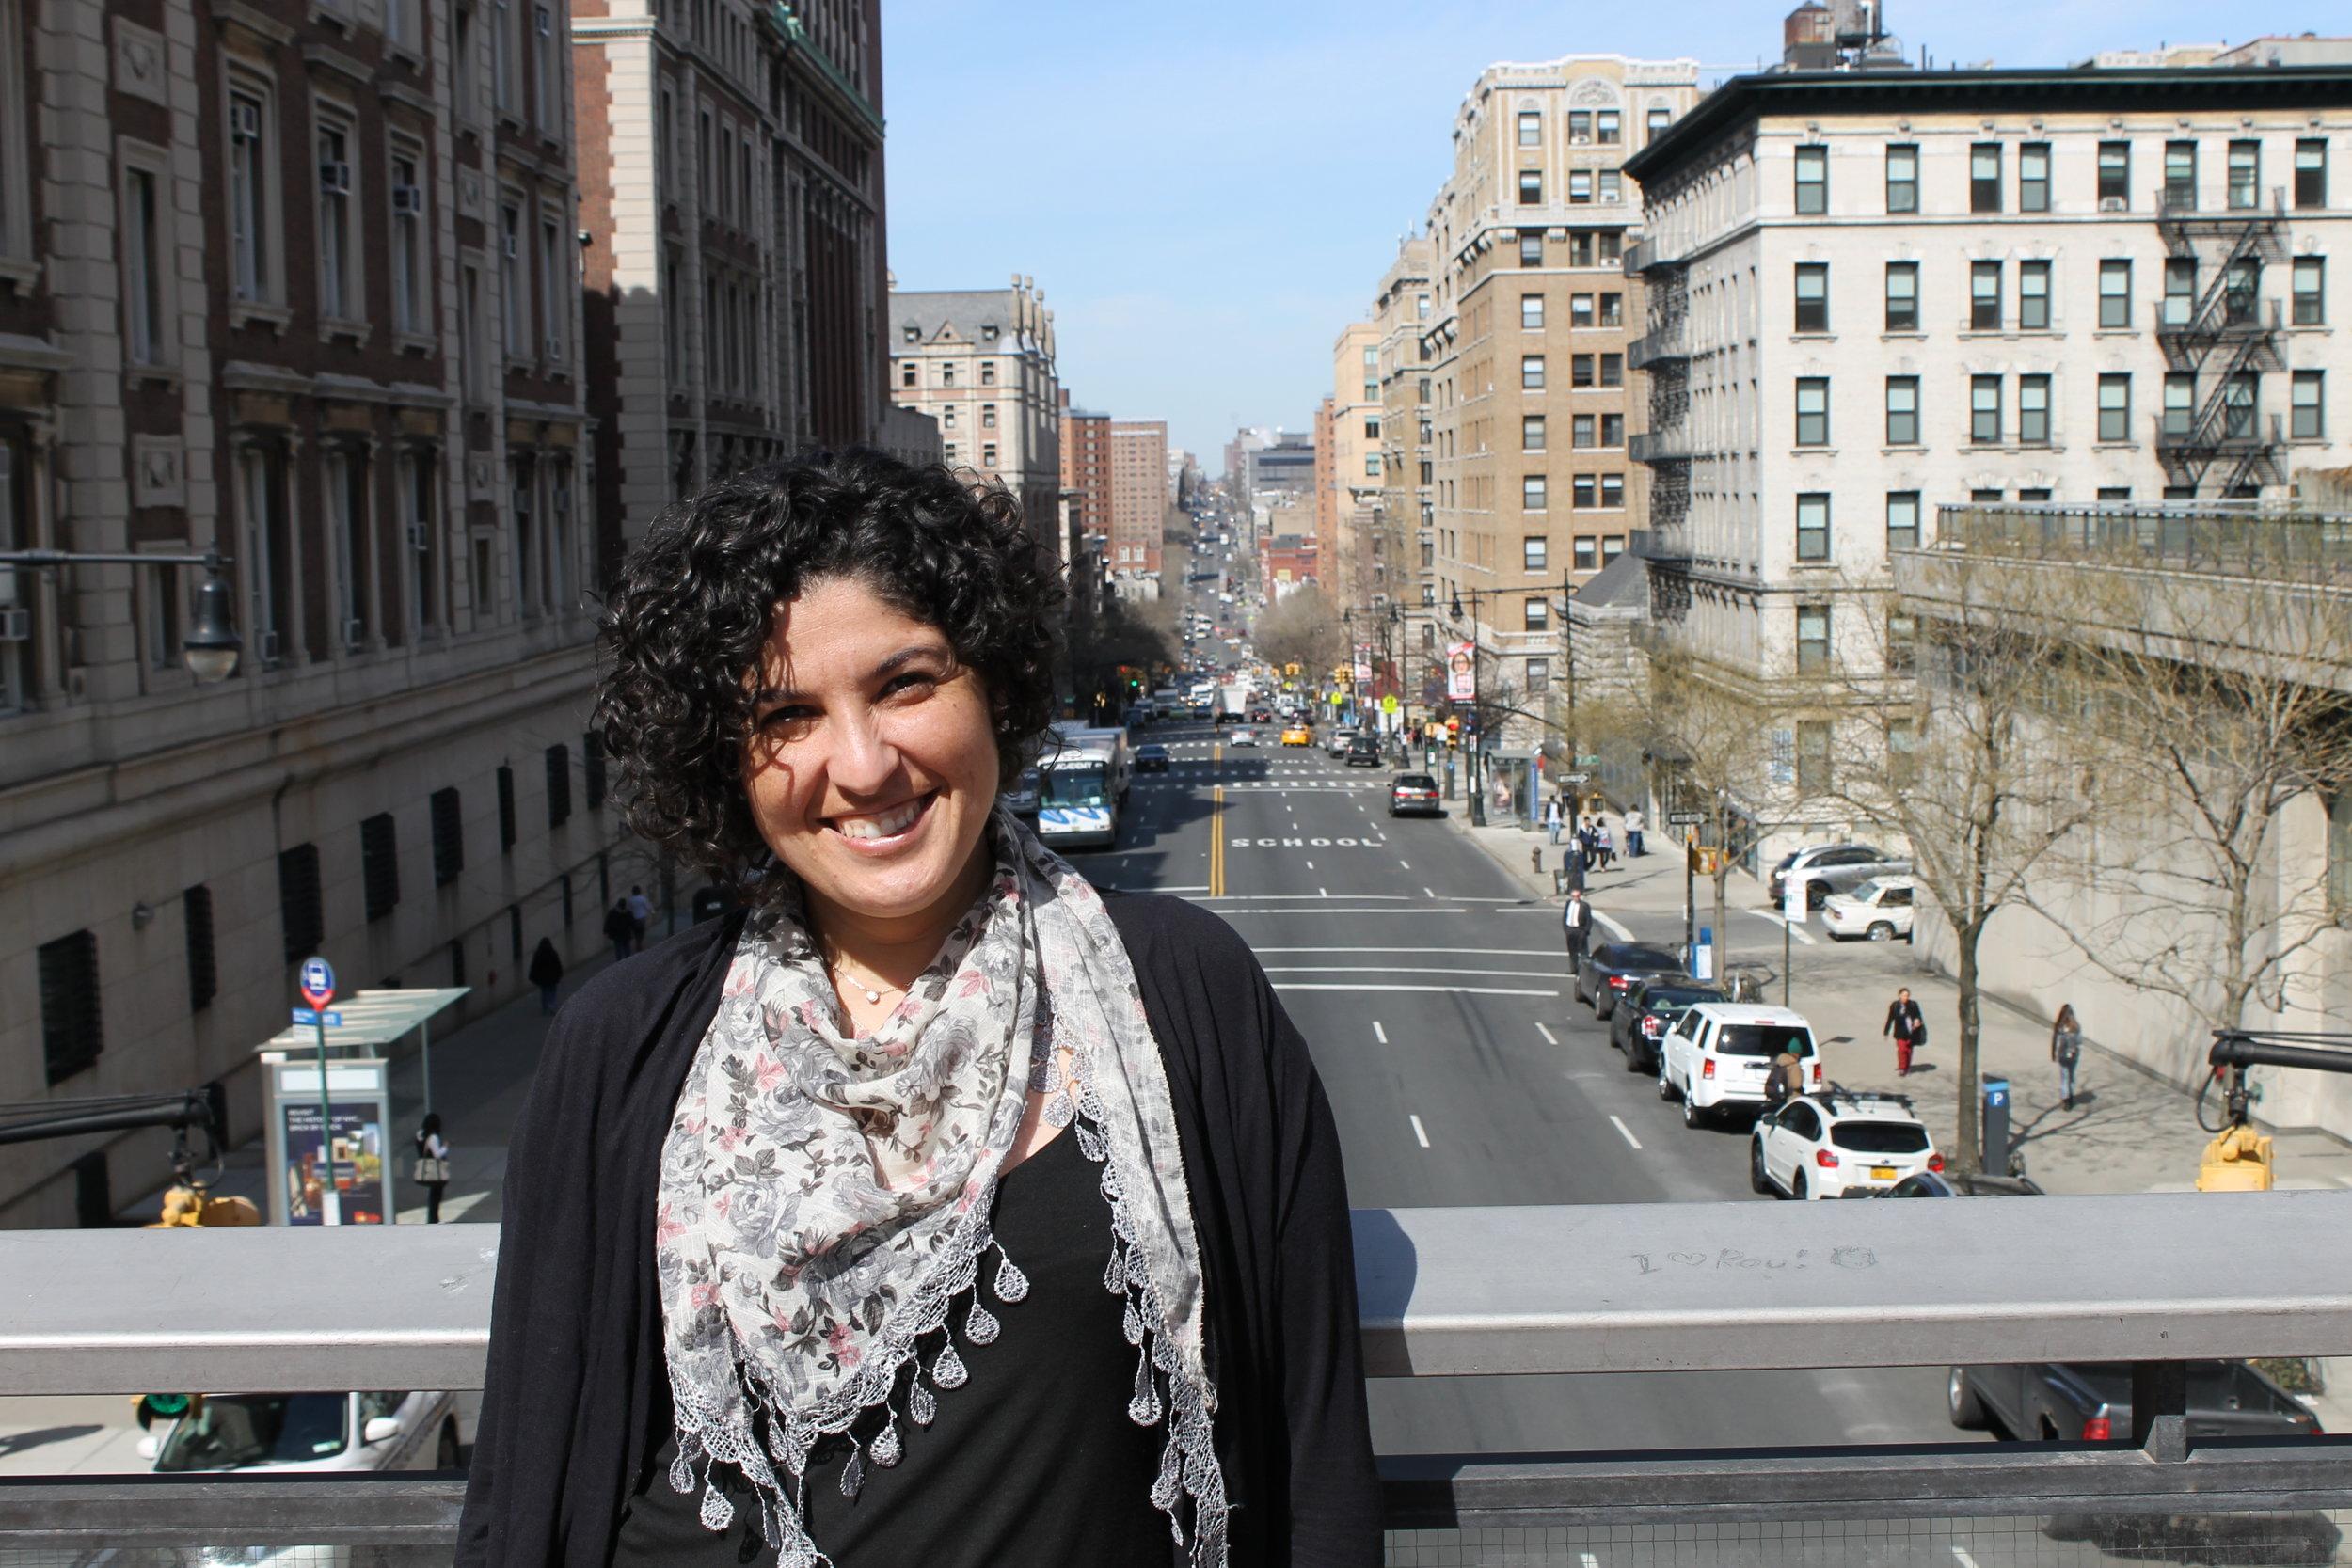 Fernanda Rosa is a PhD student in Communication at American University.